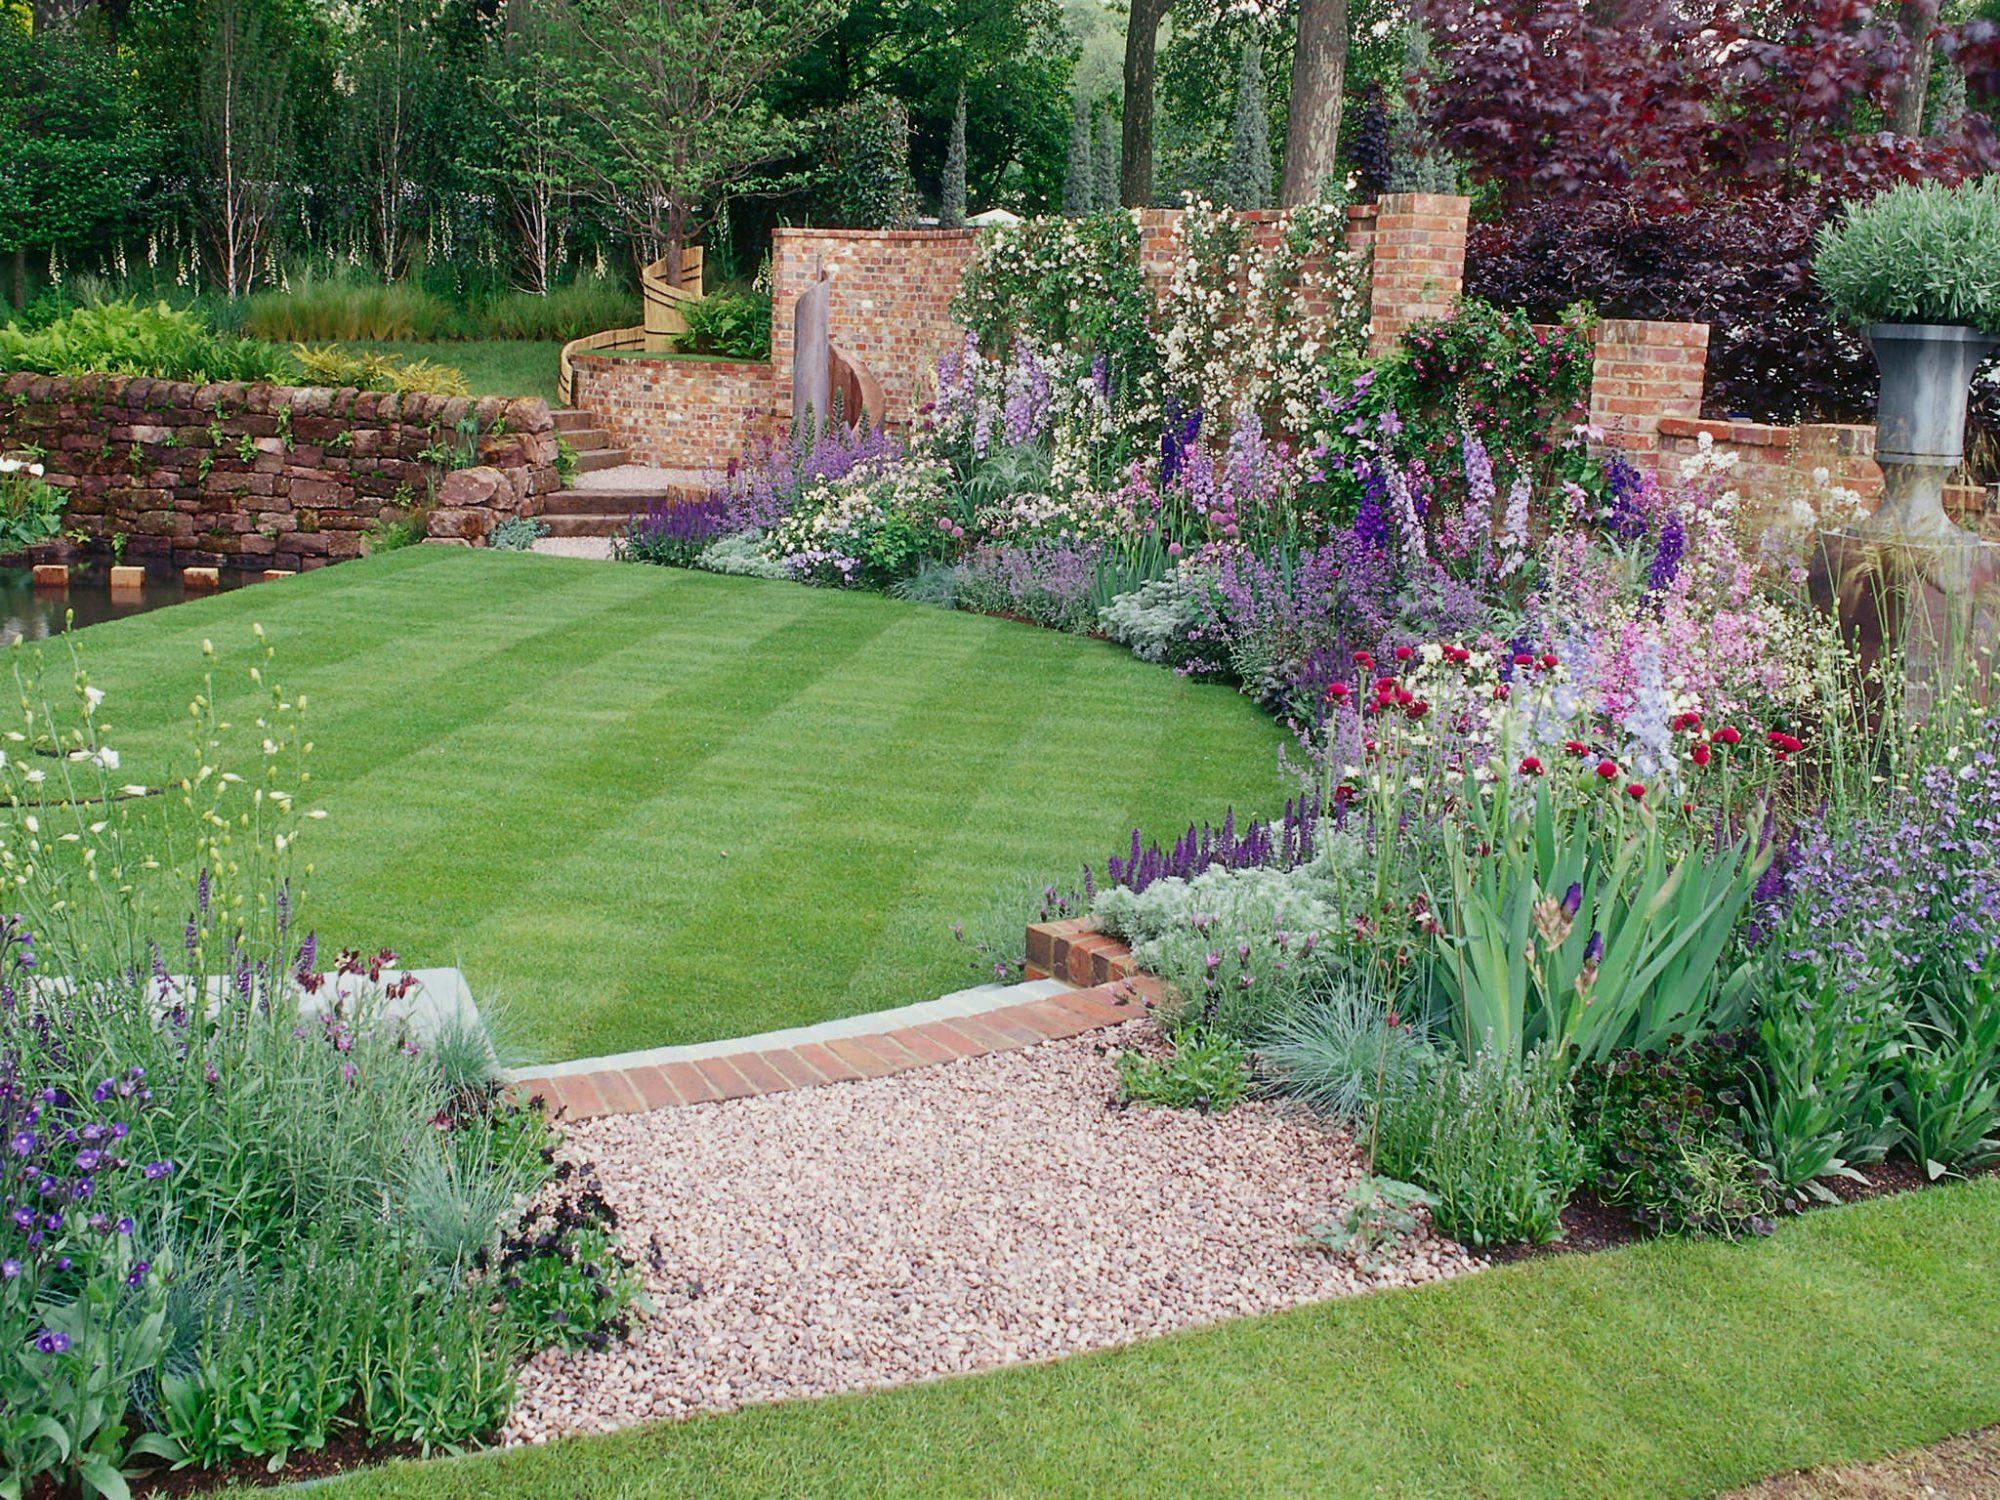 Back Patio Landscaping Ideas Luxury 25 Simple Backyard Landscaping Ideas Interior Design